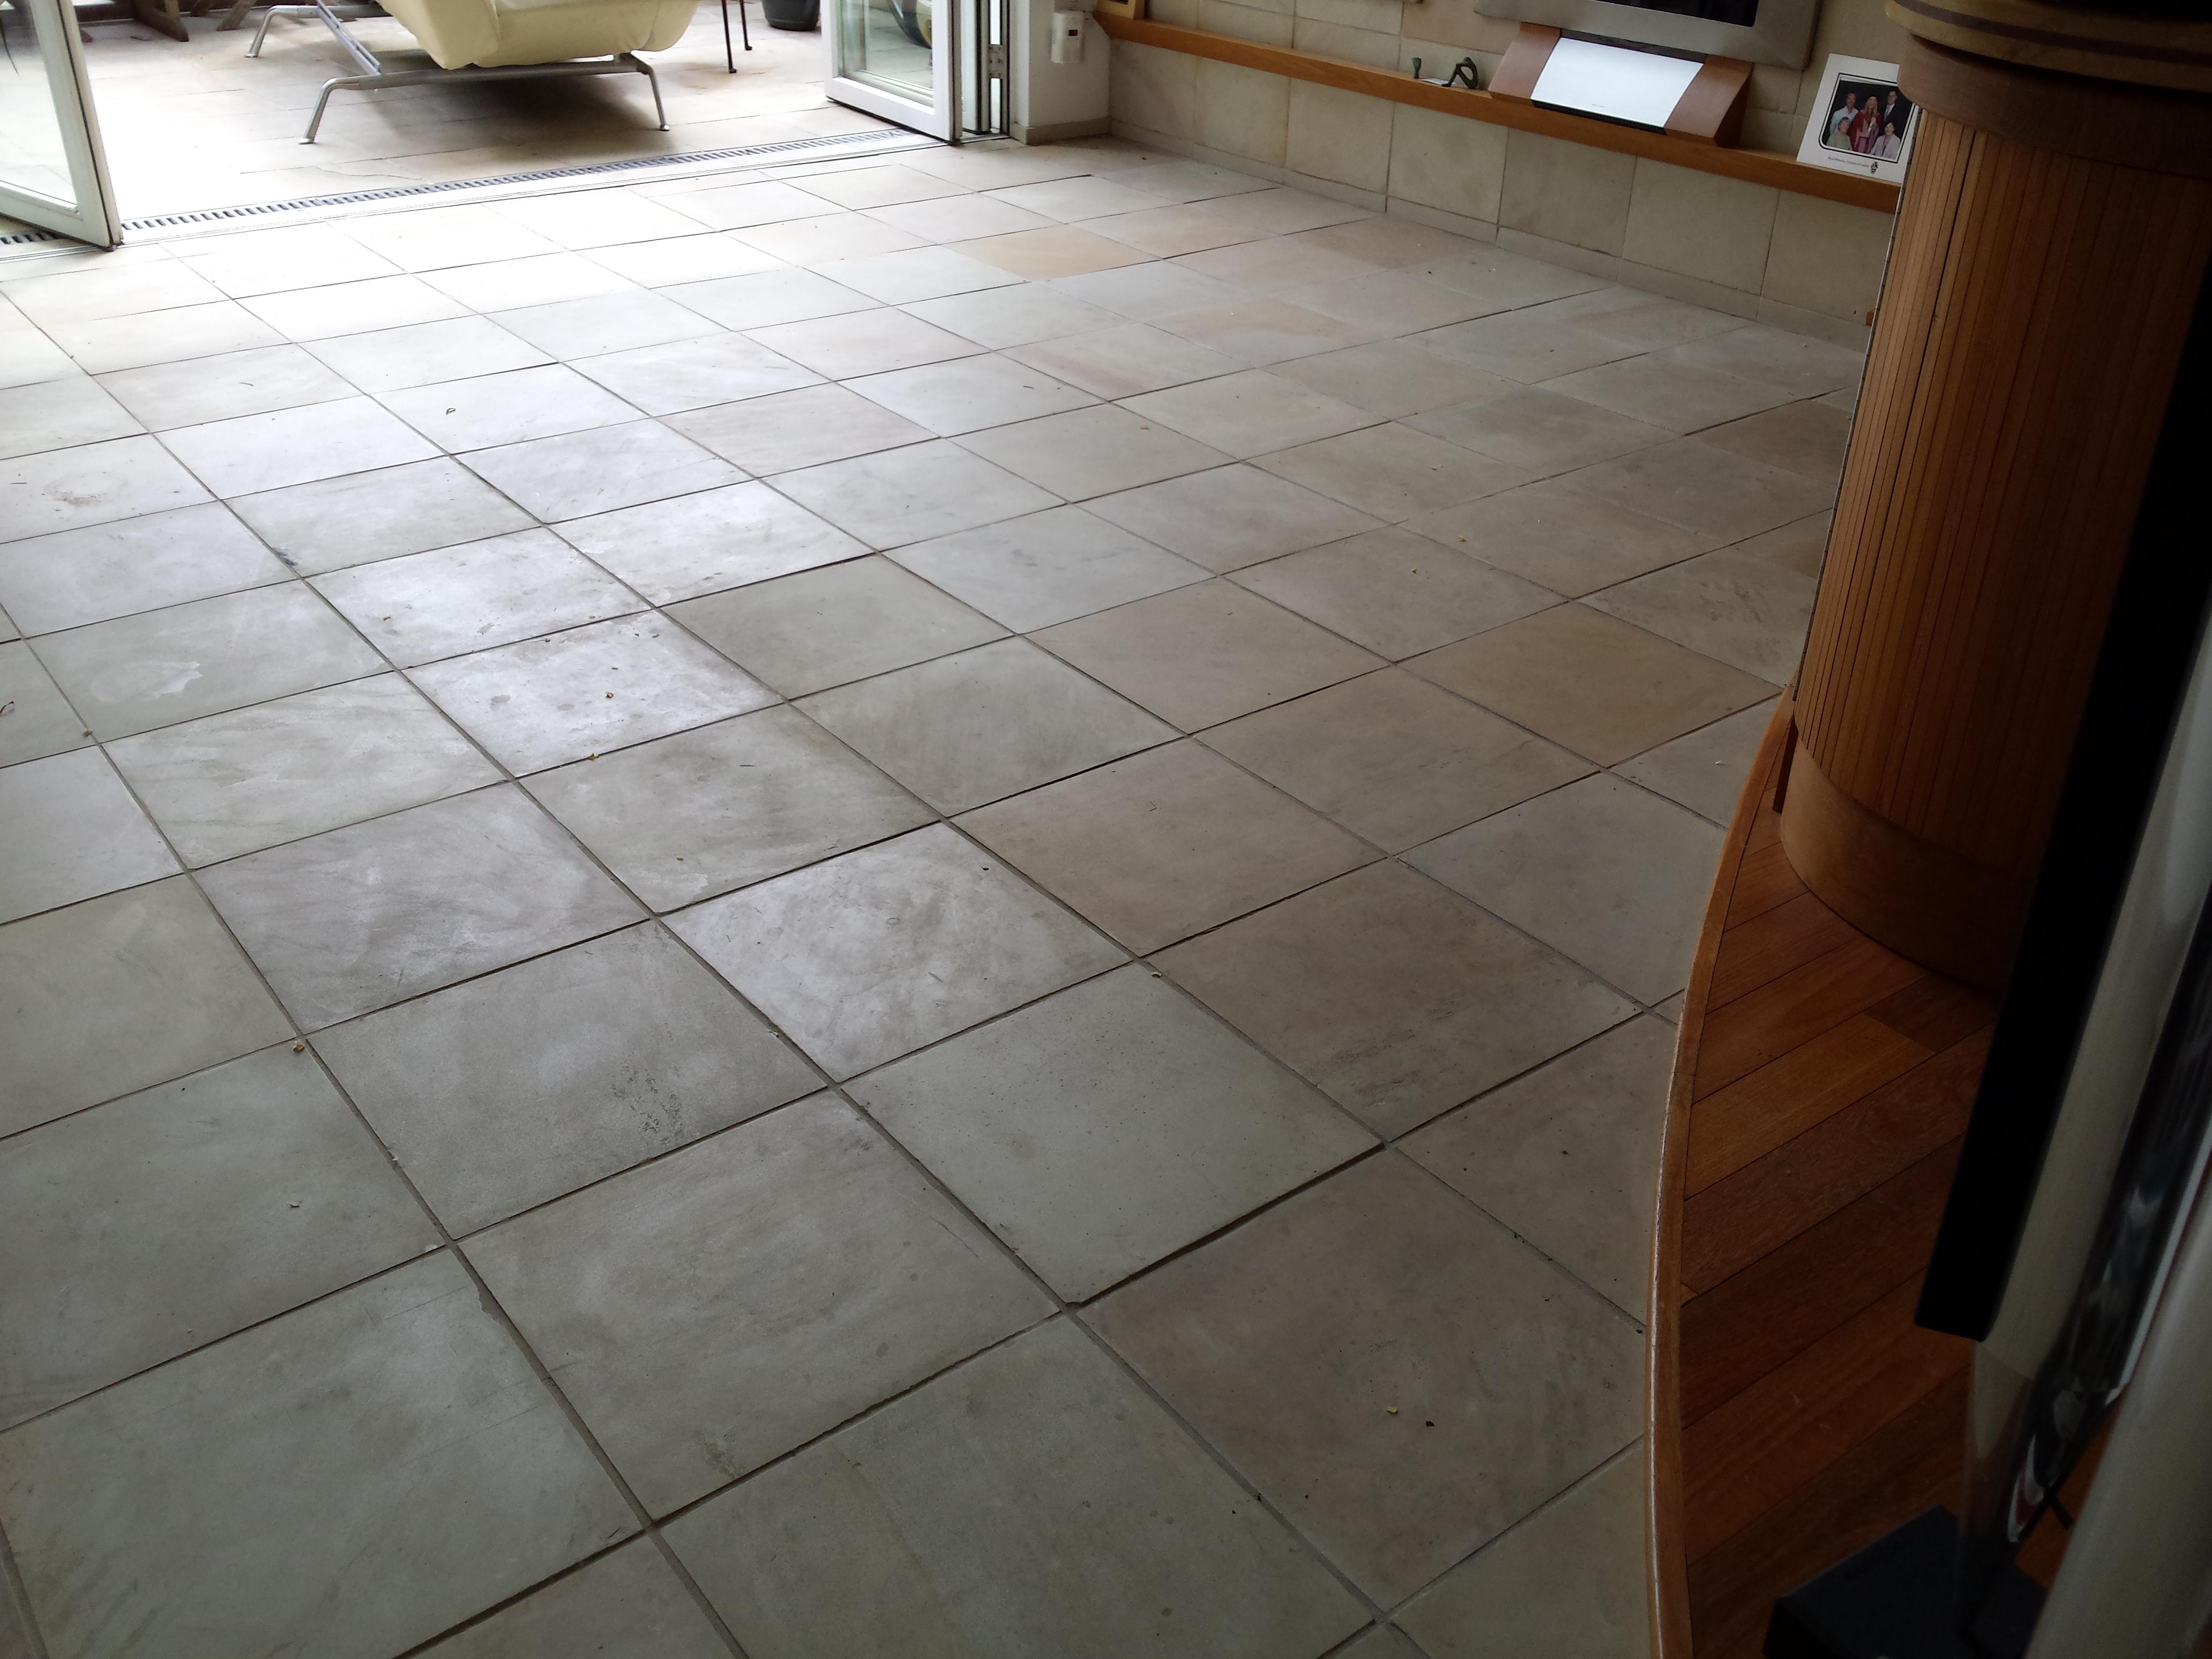 best way to clean tile floors after grouting. Black Bedroom Furniture Sets. Home Design Ideas